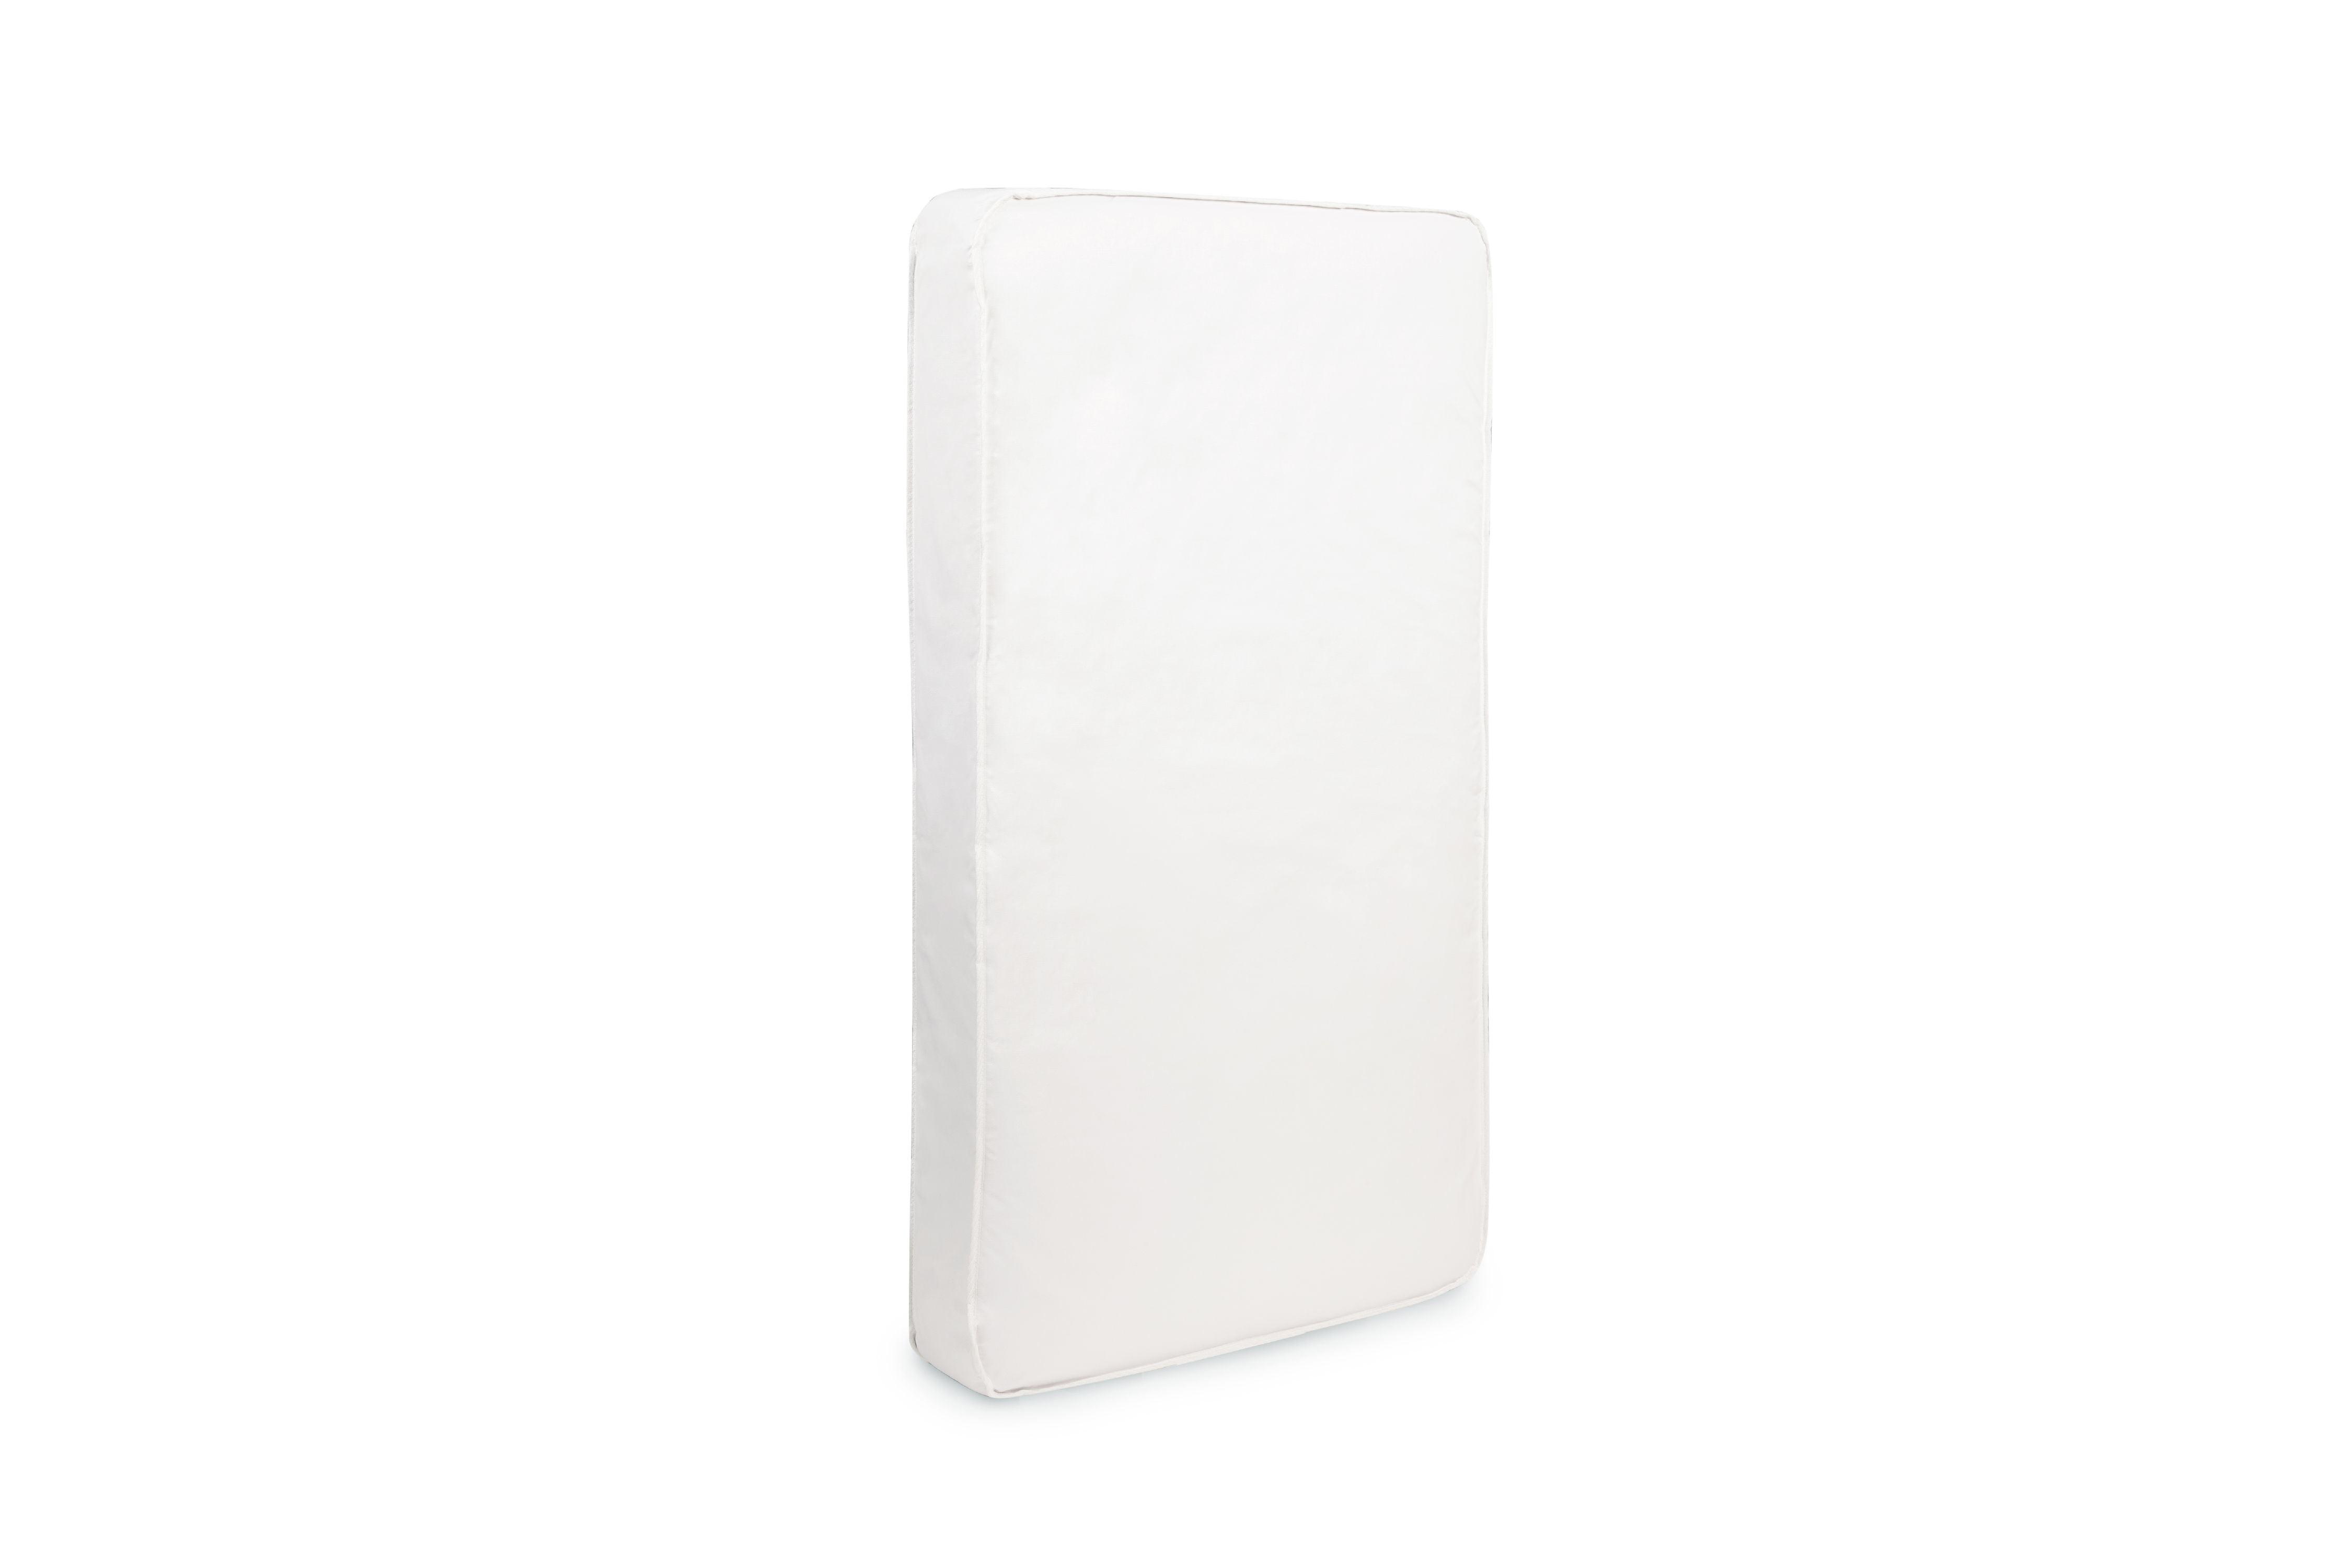 DaVinci Twilight Hypoallergenic Universal Fit Waterproof 6-Inch Ultra Firm Deluxe Crib Mattress by Davinci